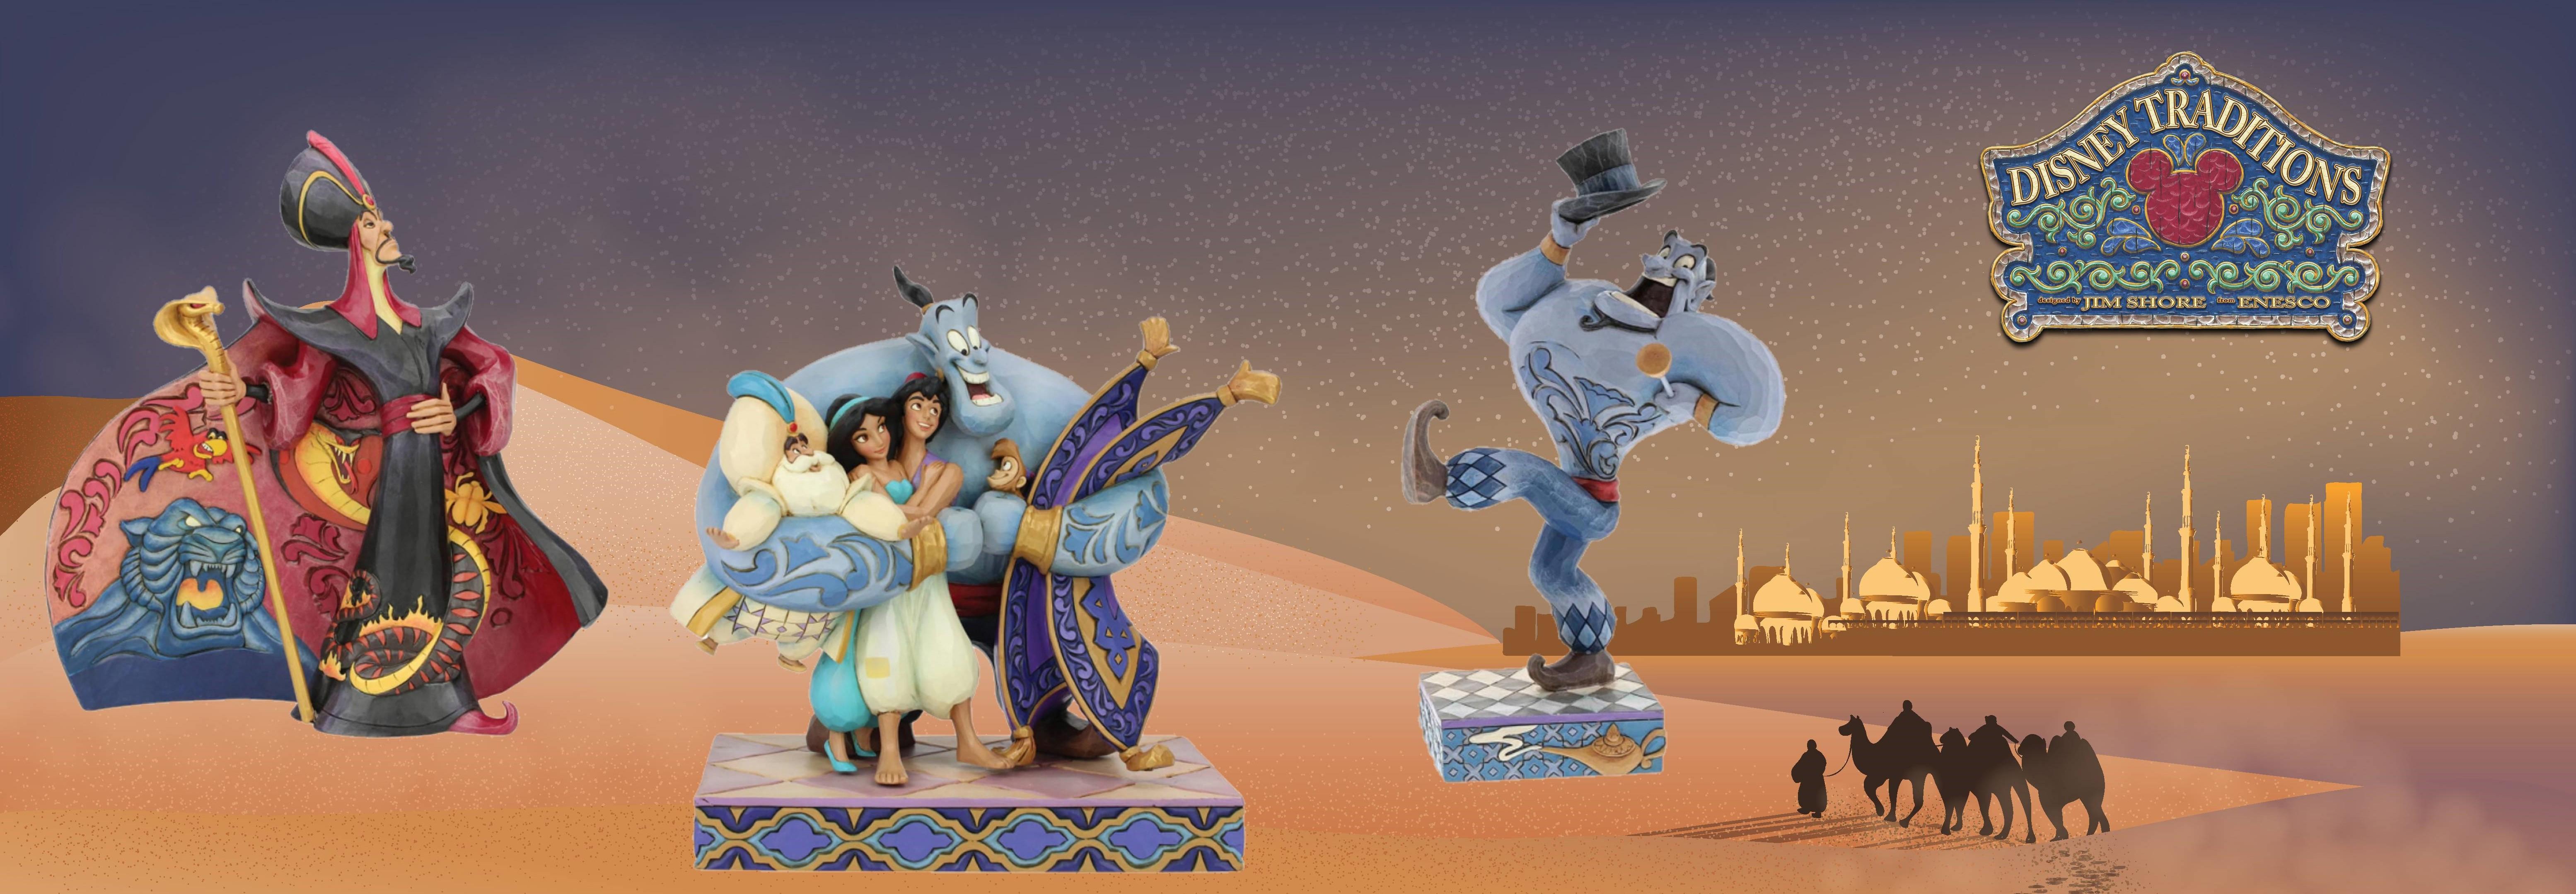 Banner-Aladdin-WustejICrmGXLiApmD